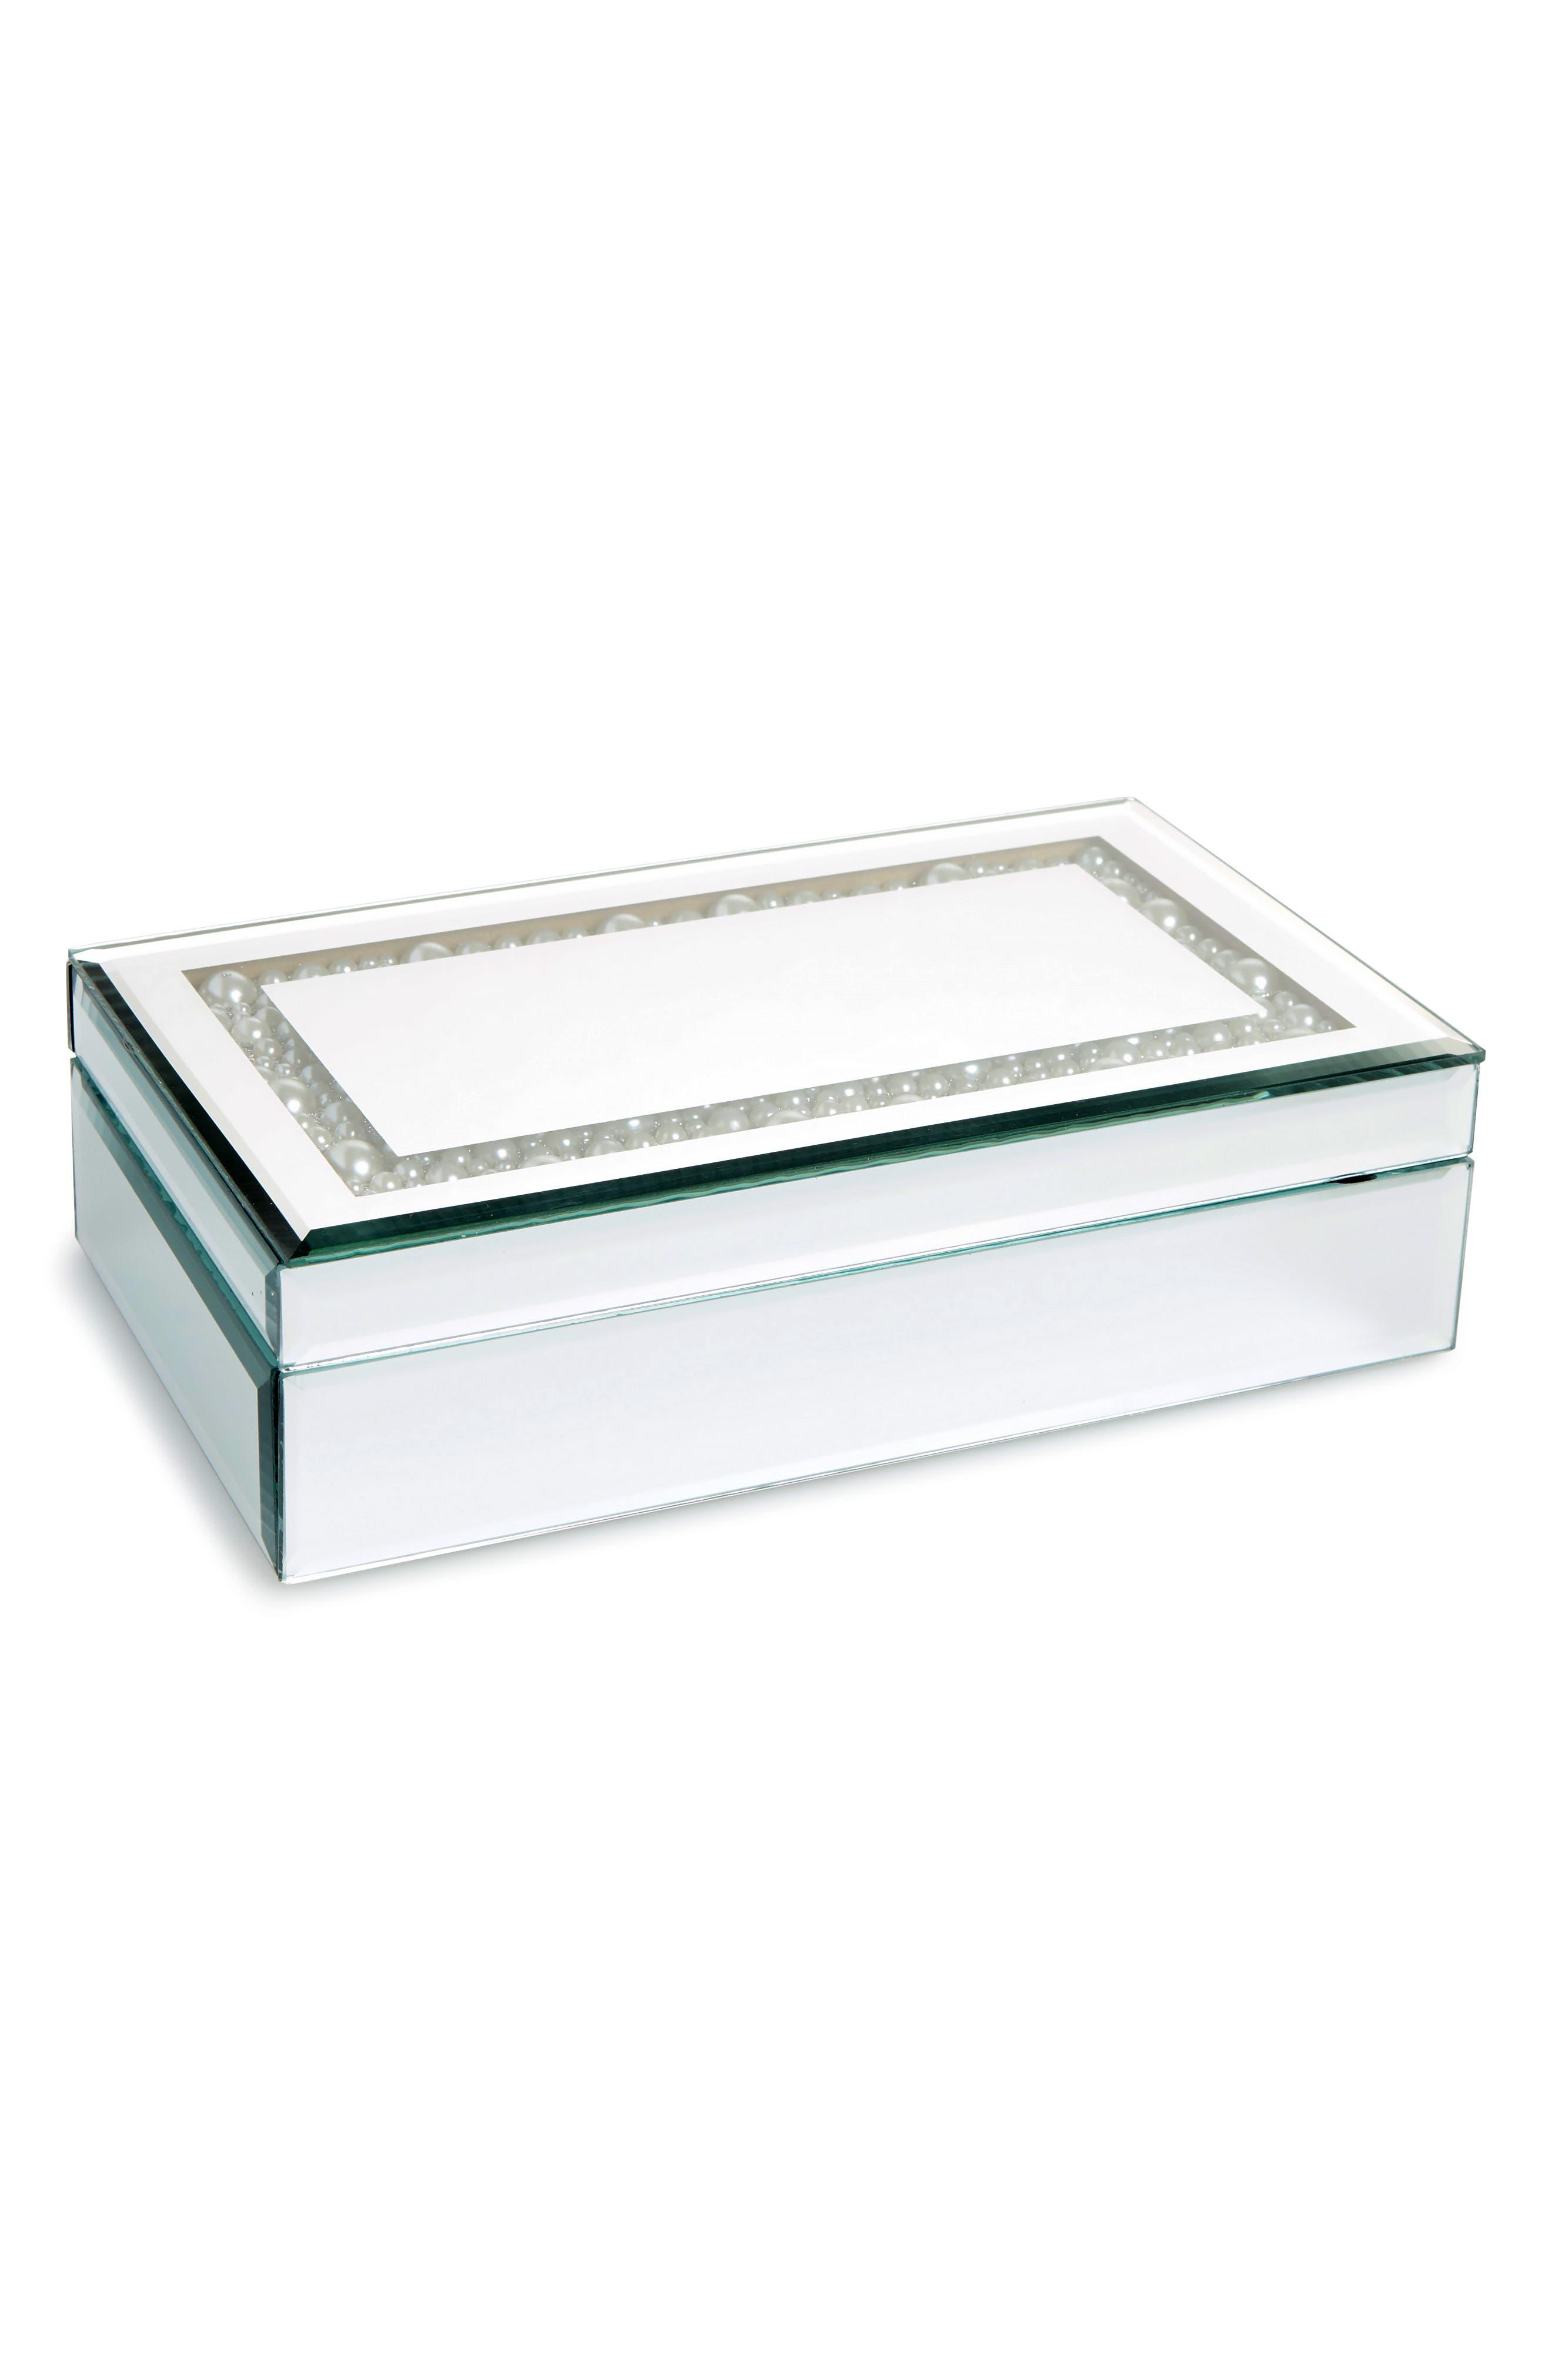 Imitation Pearl Mirror Jewelry Box